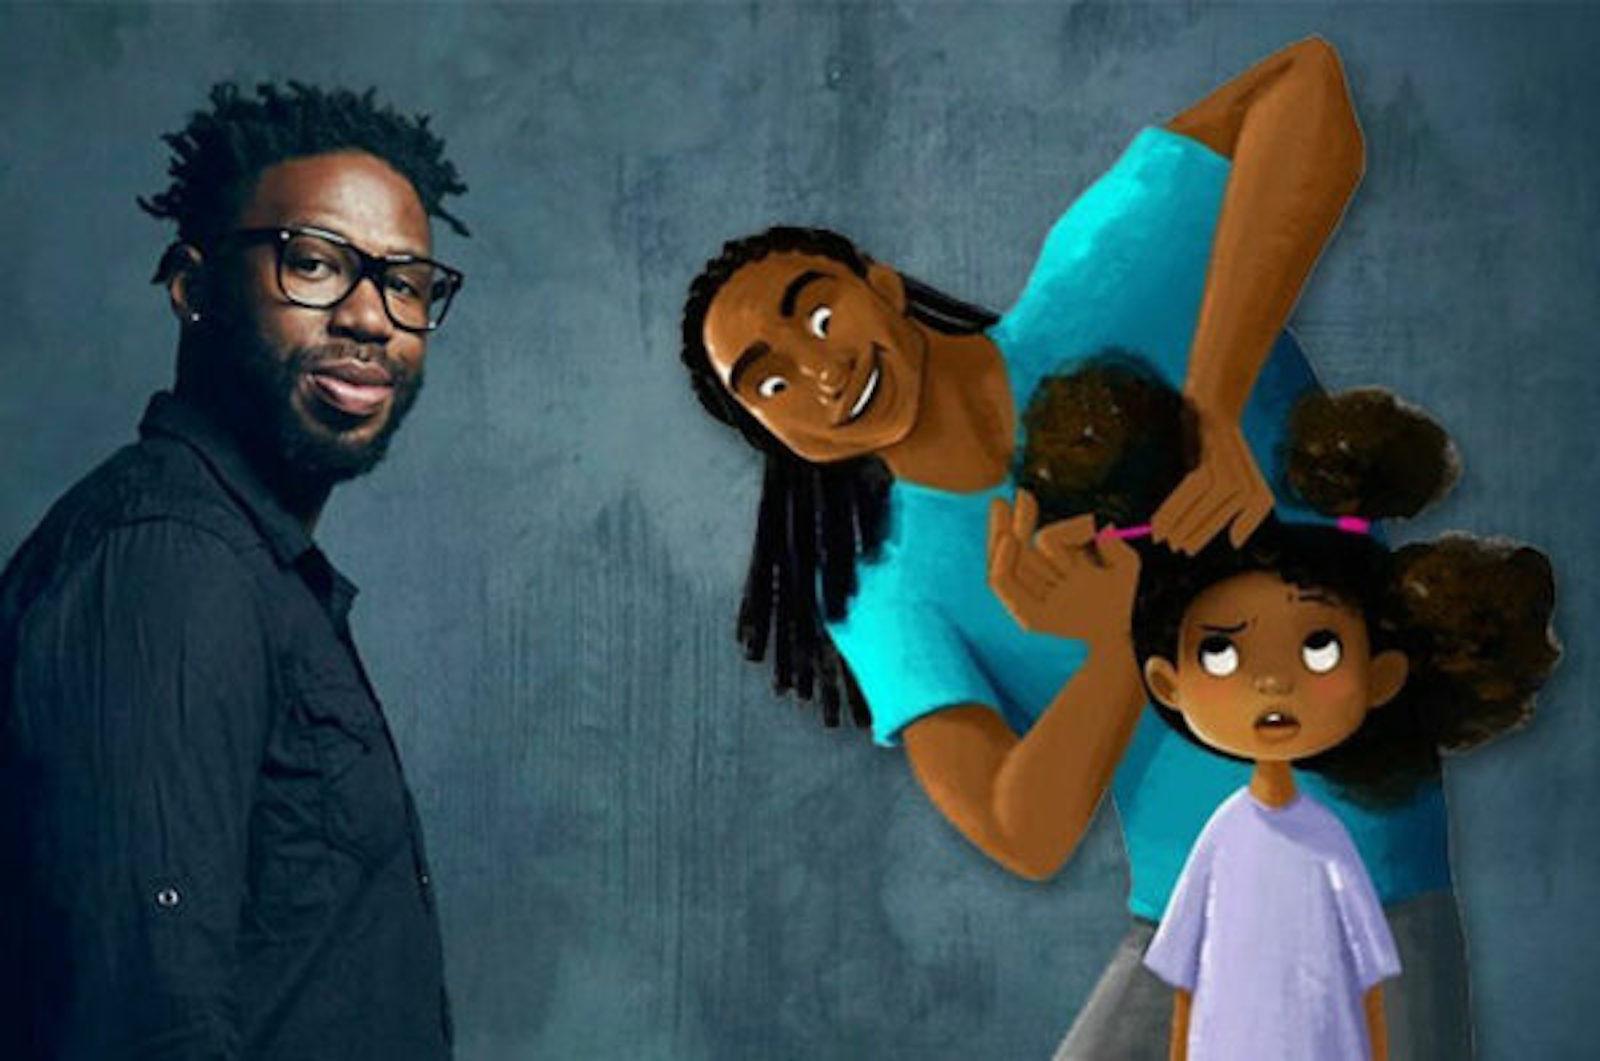 Matthew Cherry, Hair Love, African American Cinema, Black Cinema, African American Film, Black Film, KOLUMN Magazine, KOLUMN, KINDR'D Magazine, KINDR'D, Willoughby Avenue, Wriit,